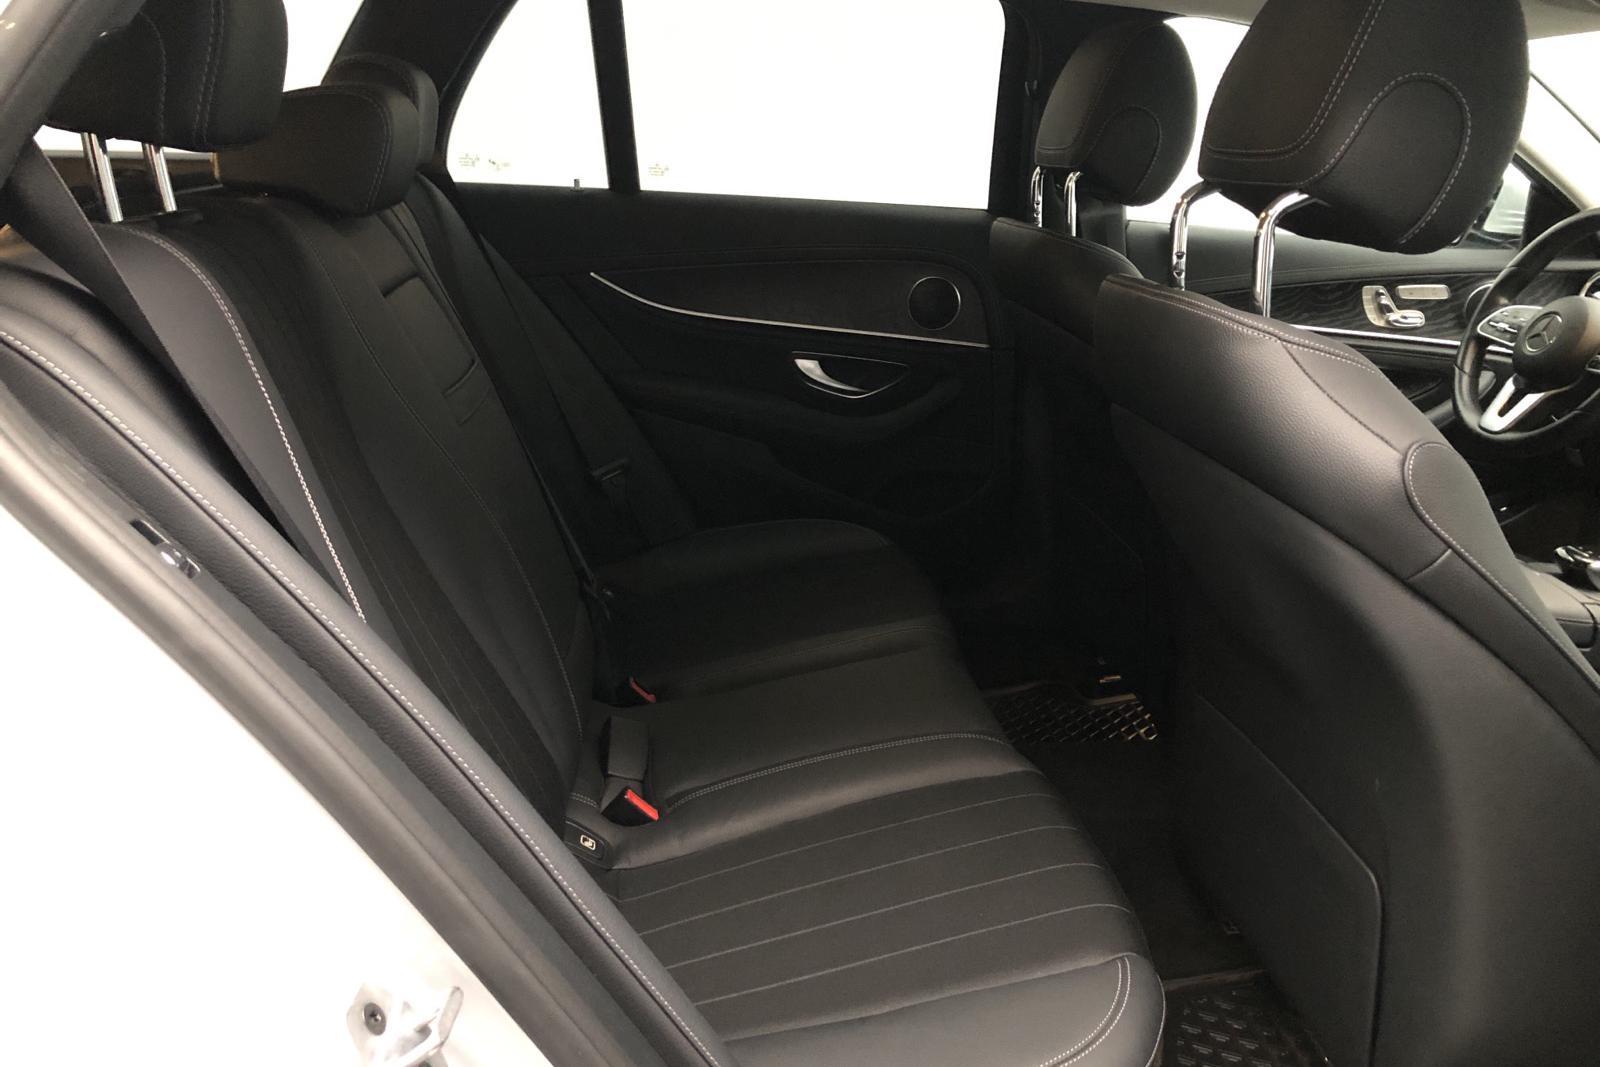 Mercedes E 220 d 4MATIC Kombi All-Terrain S213 (194hk) - 0 km - silver - 2019